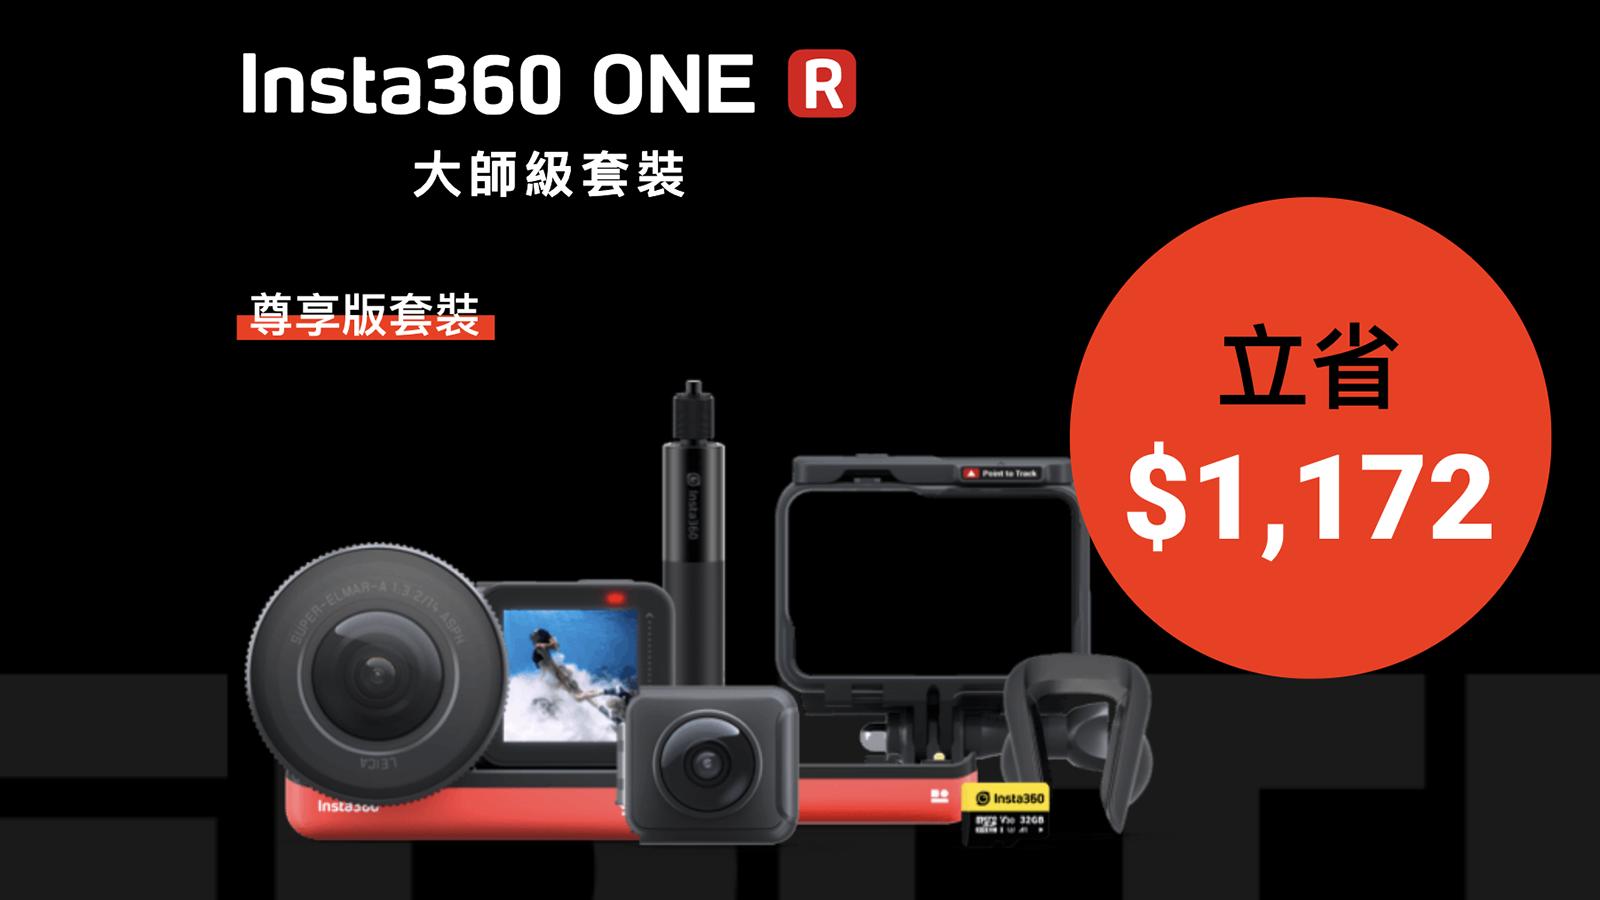 Insta360 One R Black Friday deal